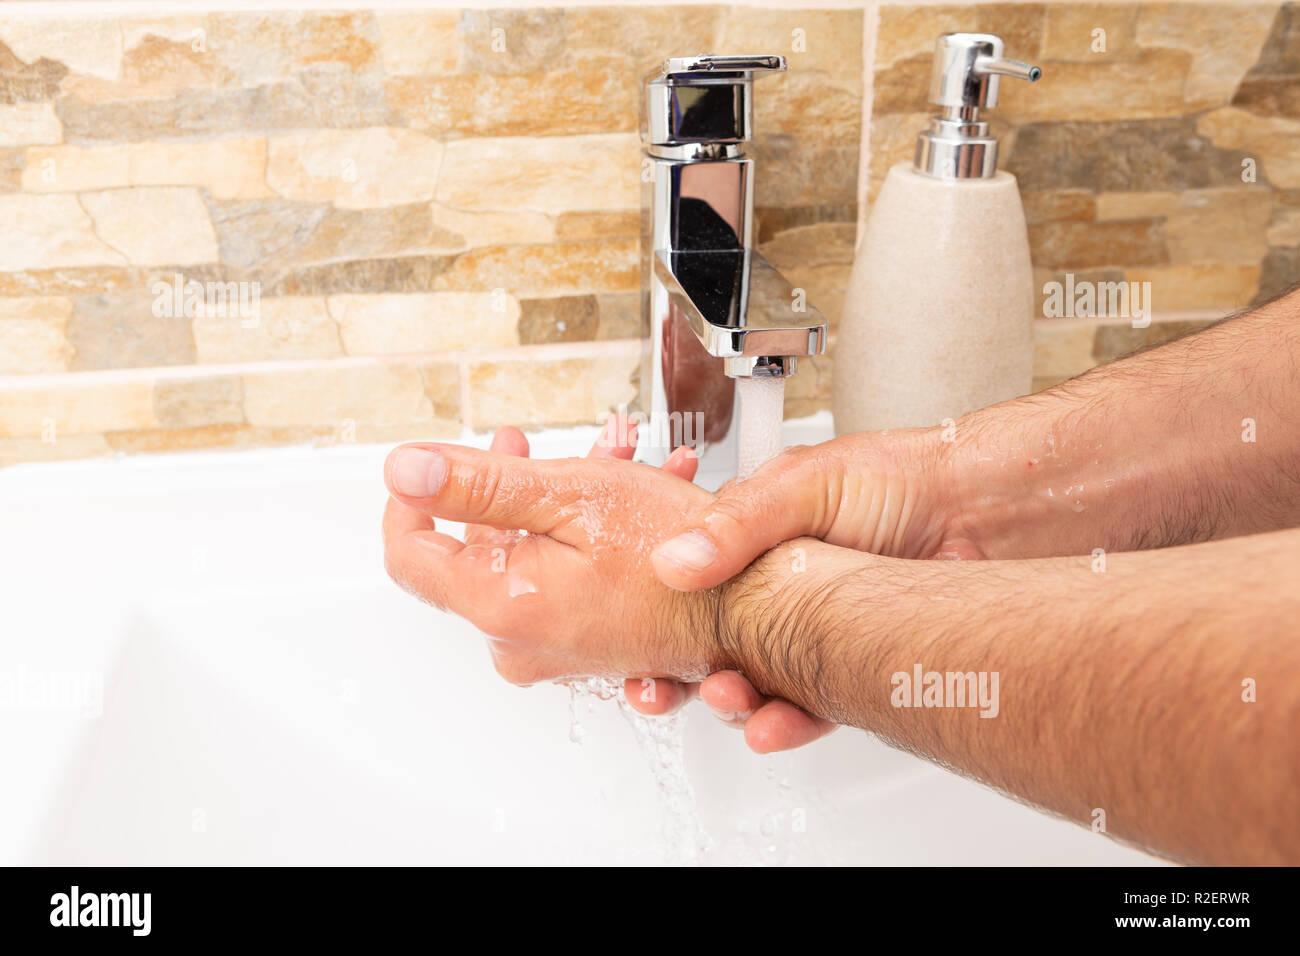 enorme rasata rubinetti